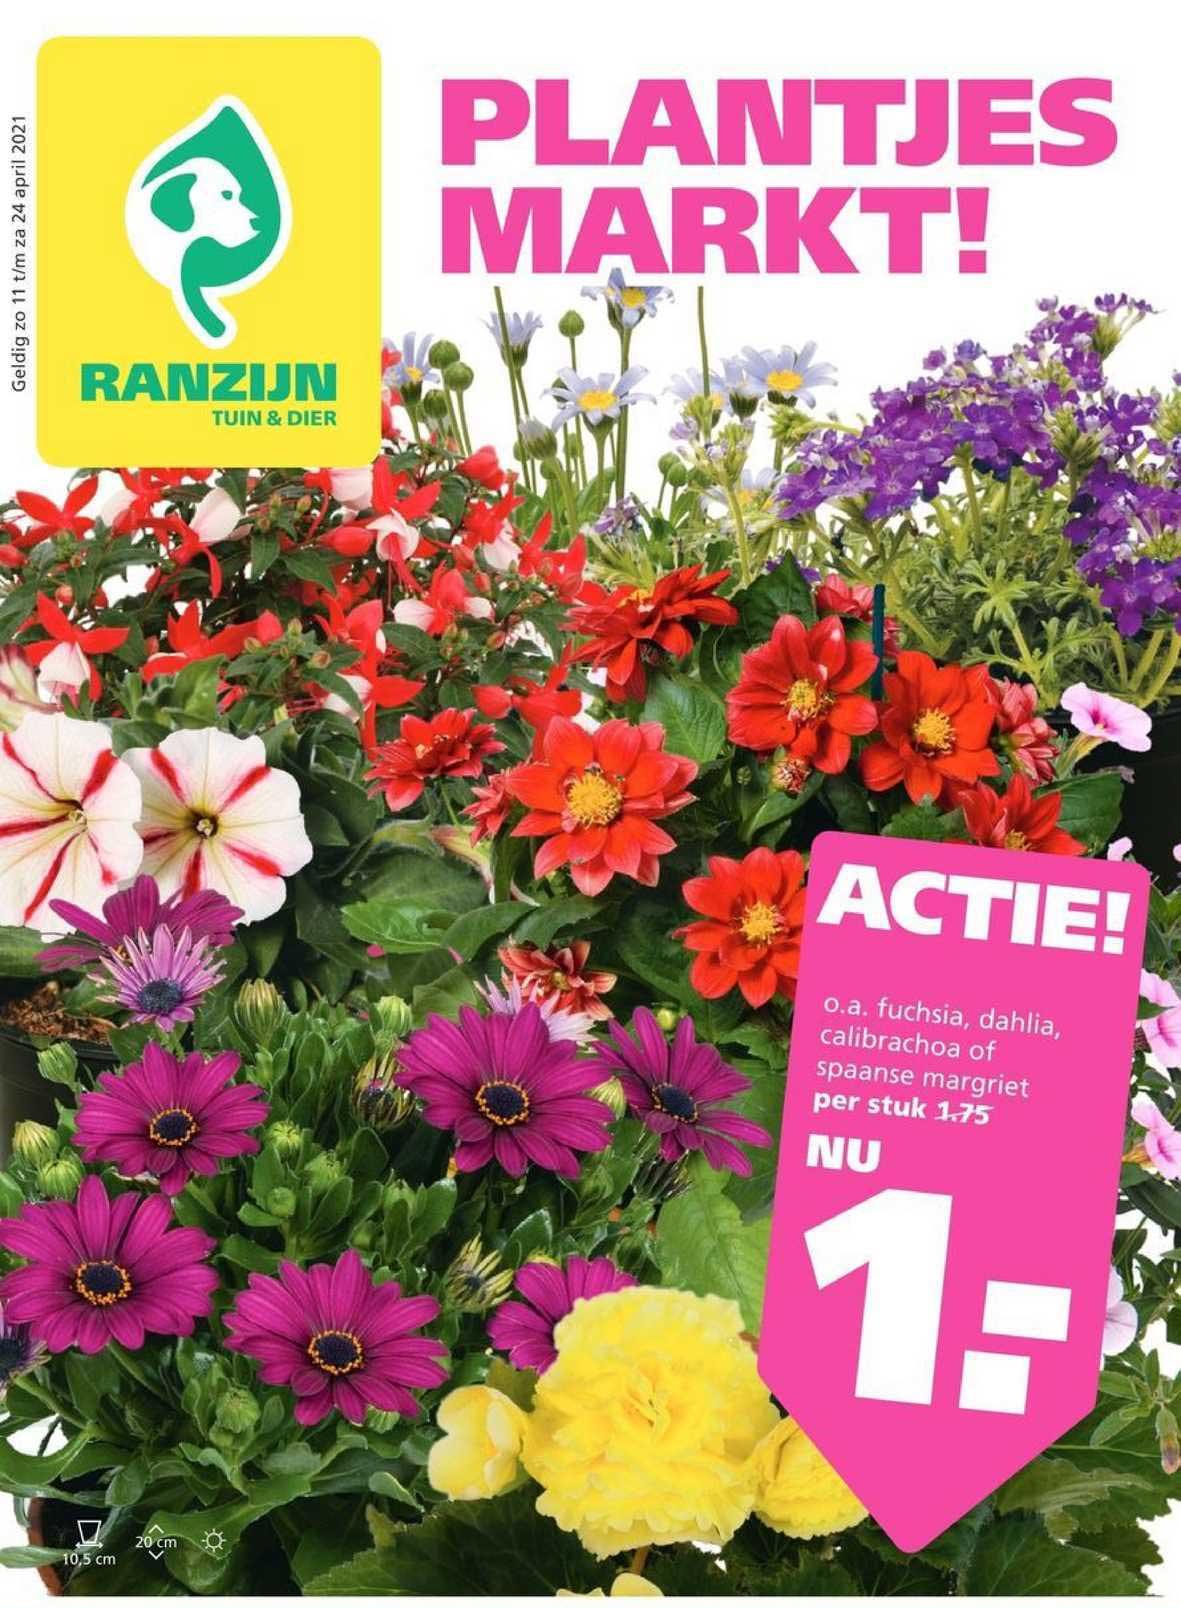 Ranzijn Tuin & Dier Fuchsia, Dahlia, Calibrachoa OfSpaanse Margriet